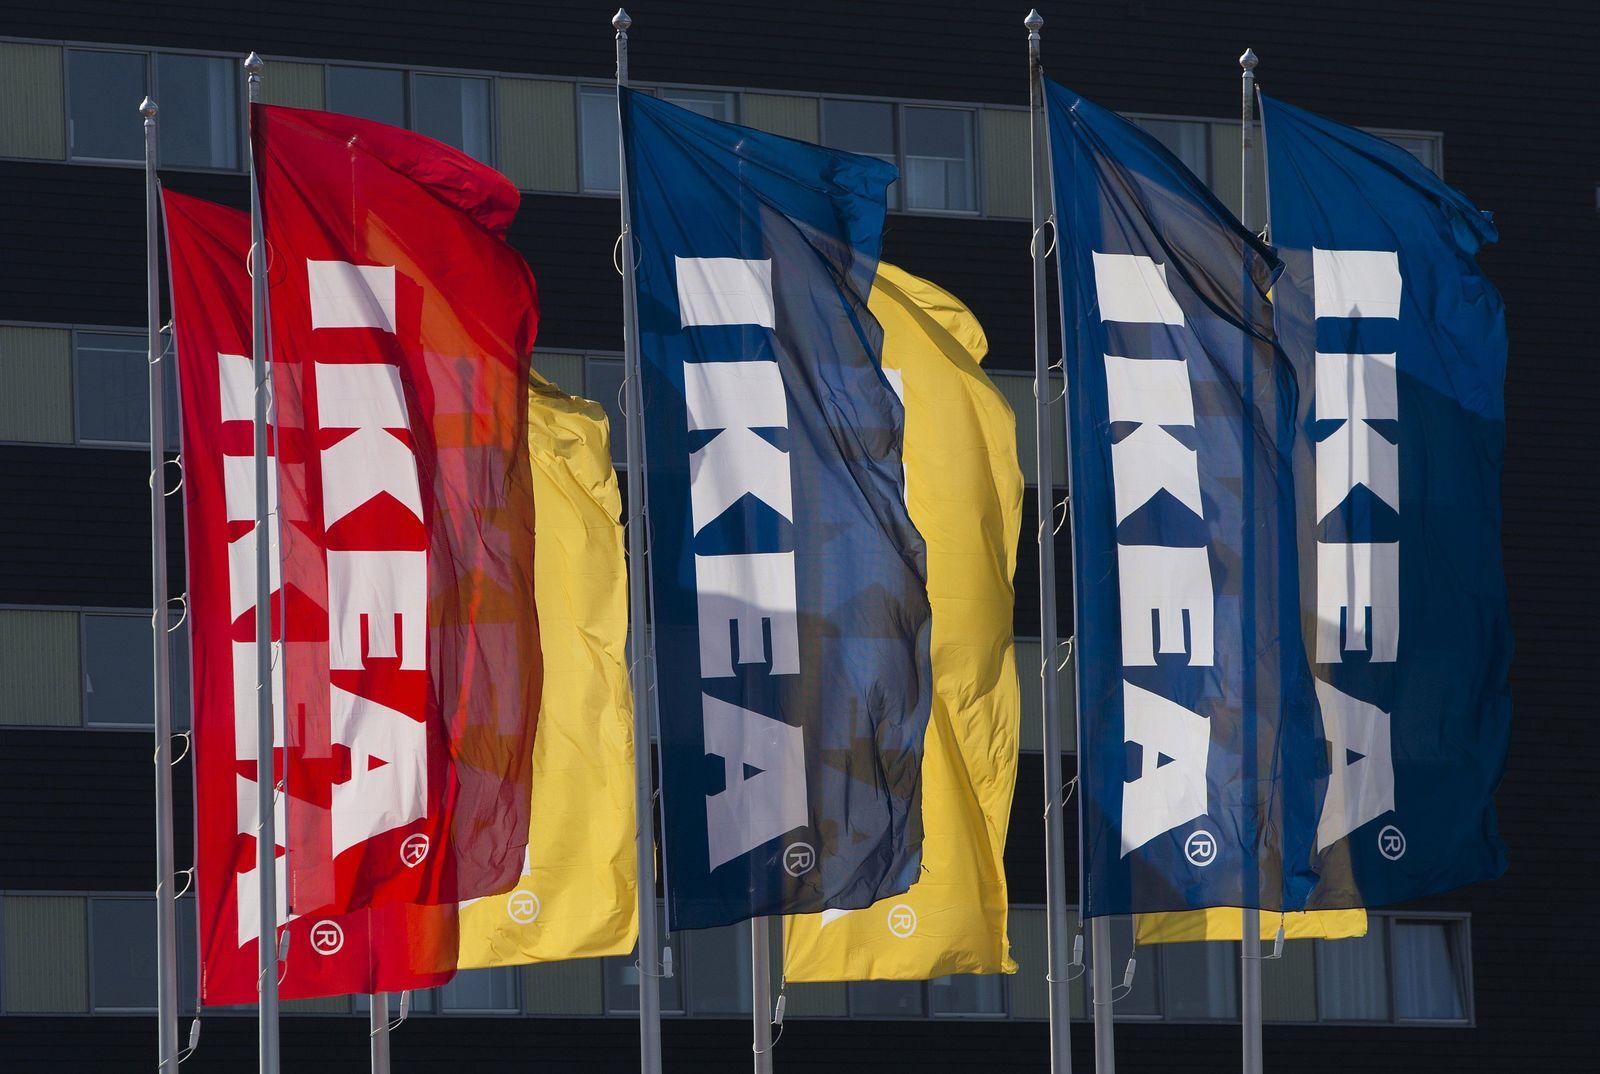 IKEA-RESTRUCTURING/ÃÂ